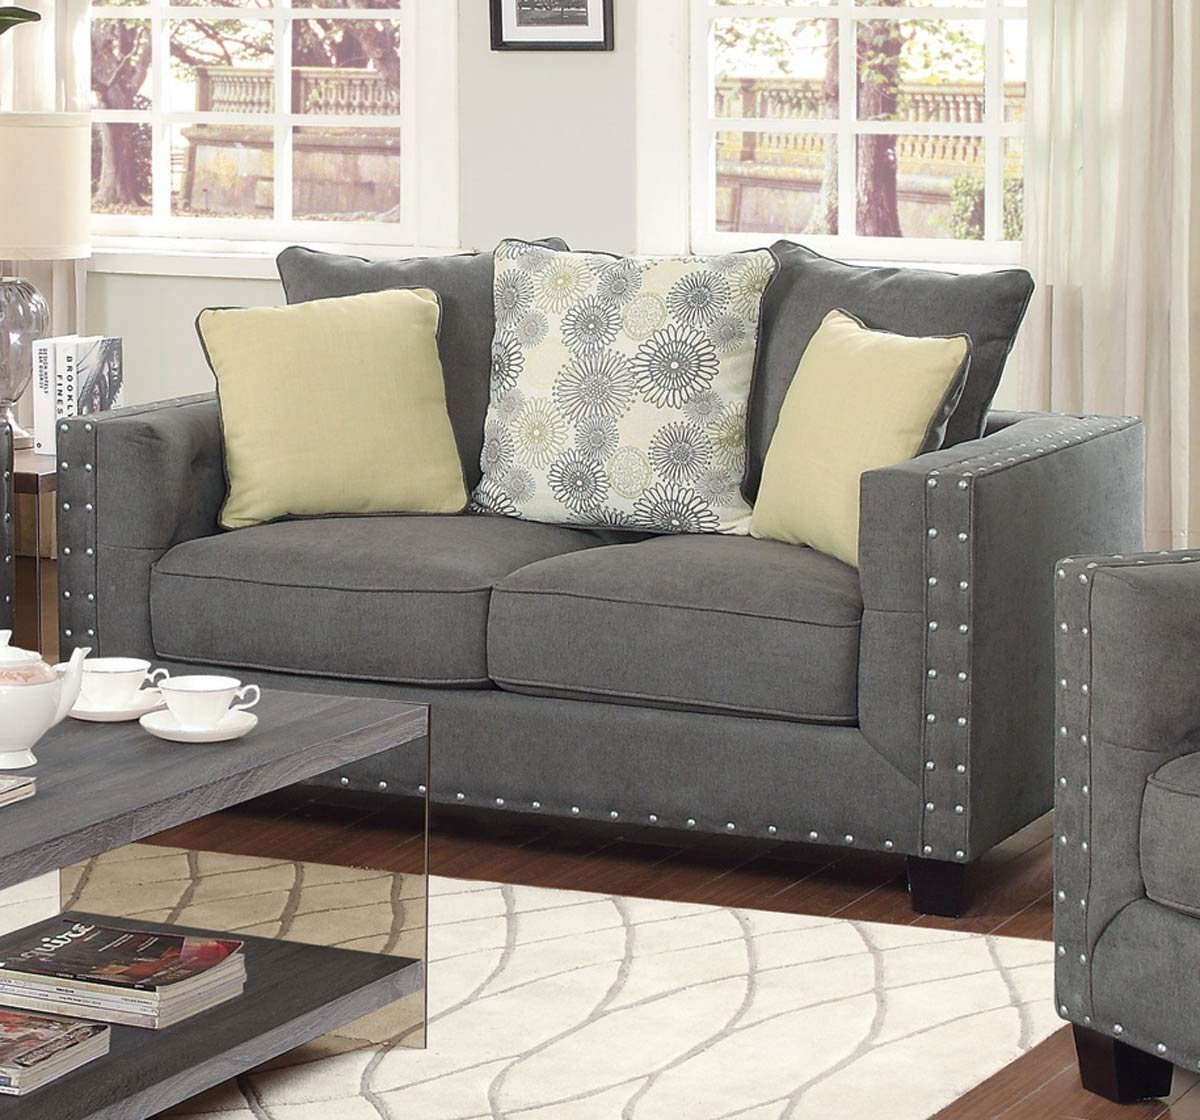 Coaster 501422 Home Furnishings Love Seat - Charcoal